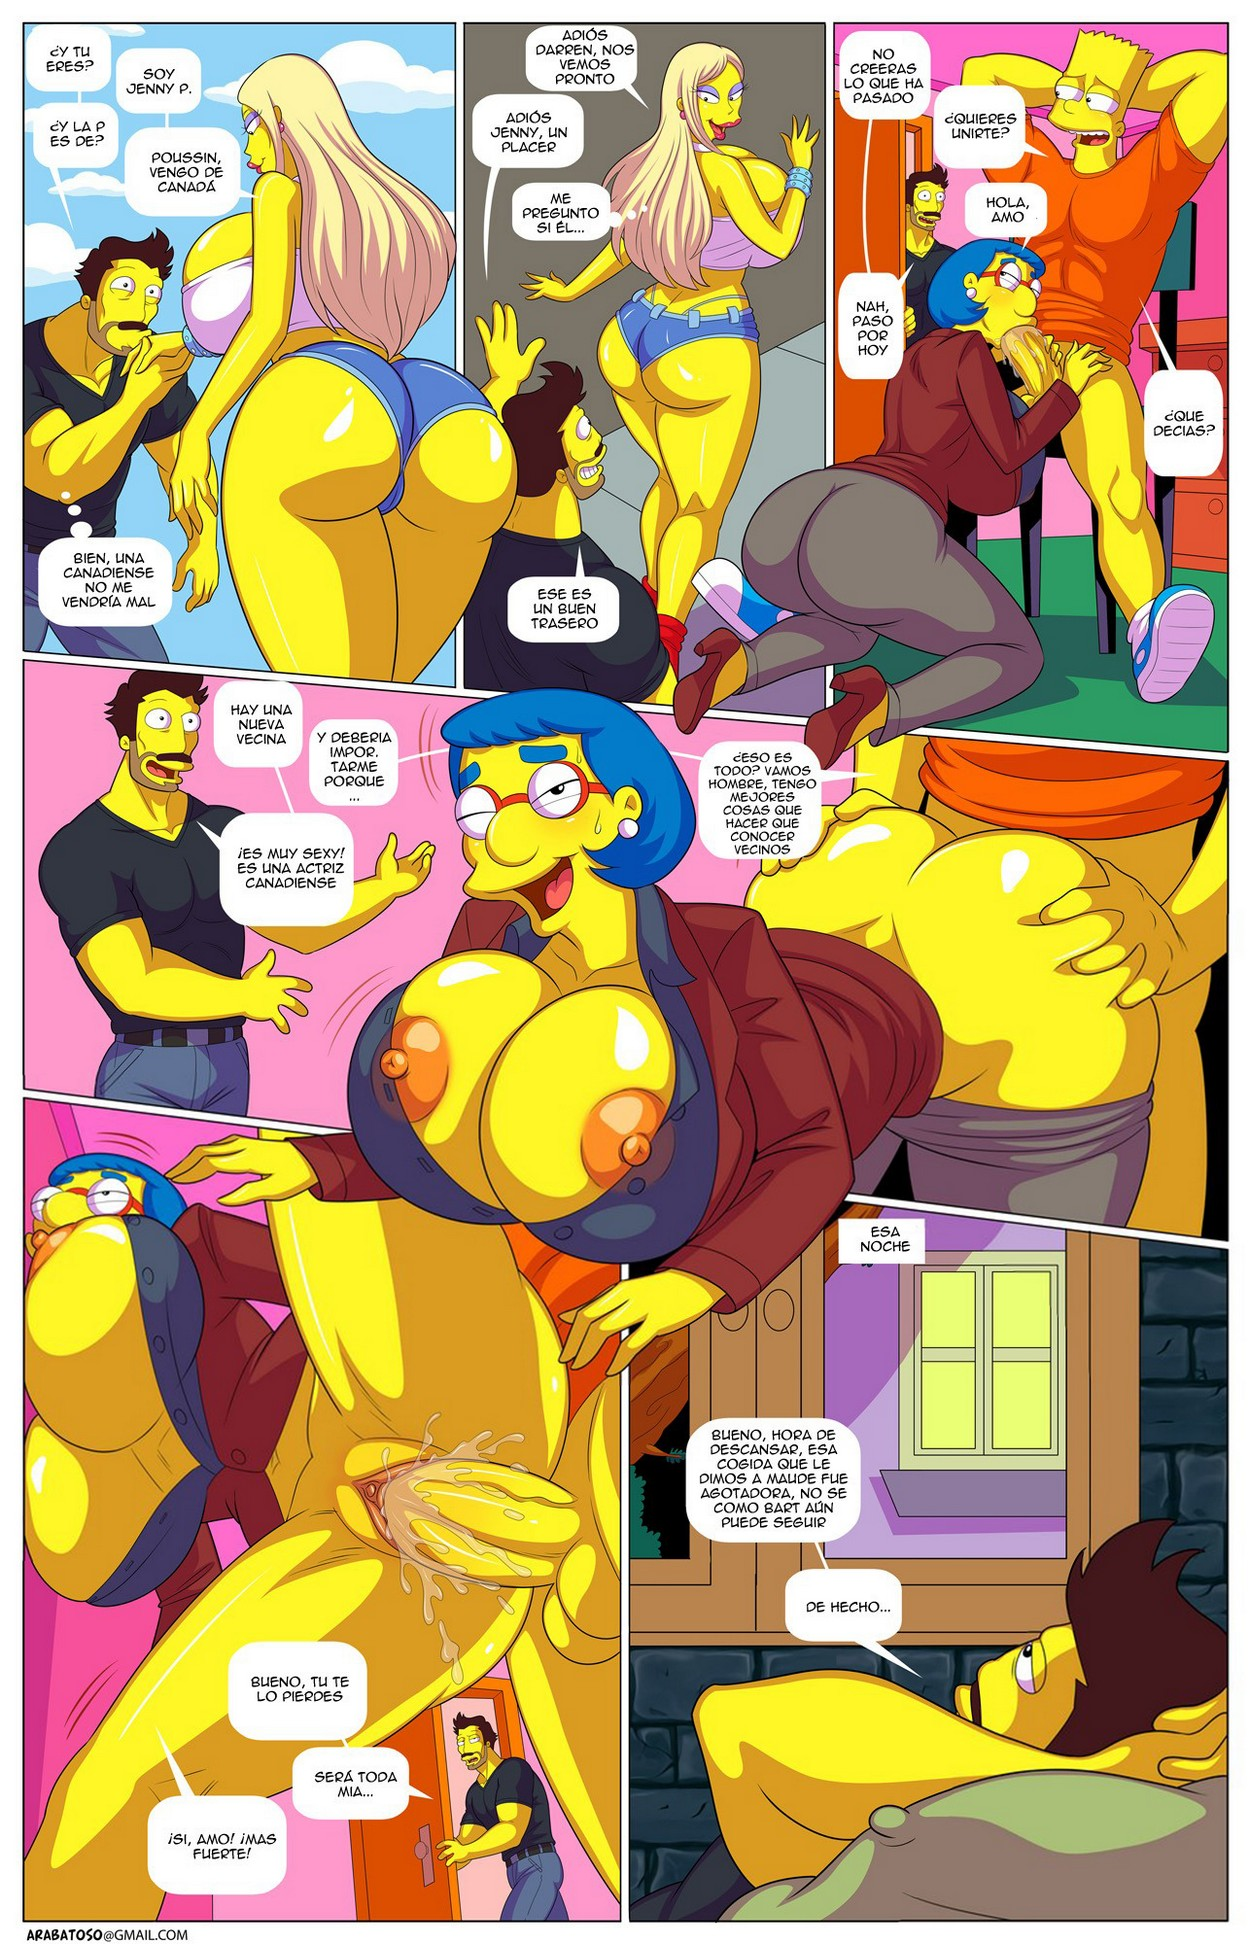 Hardcore Simpsons porno